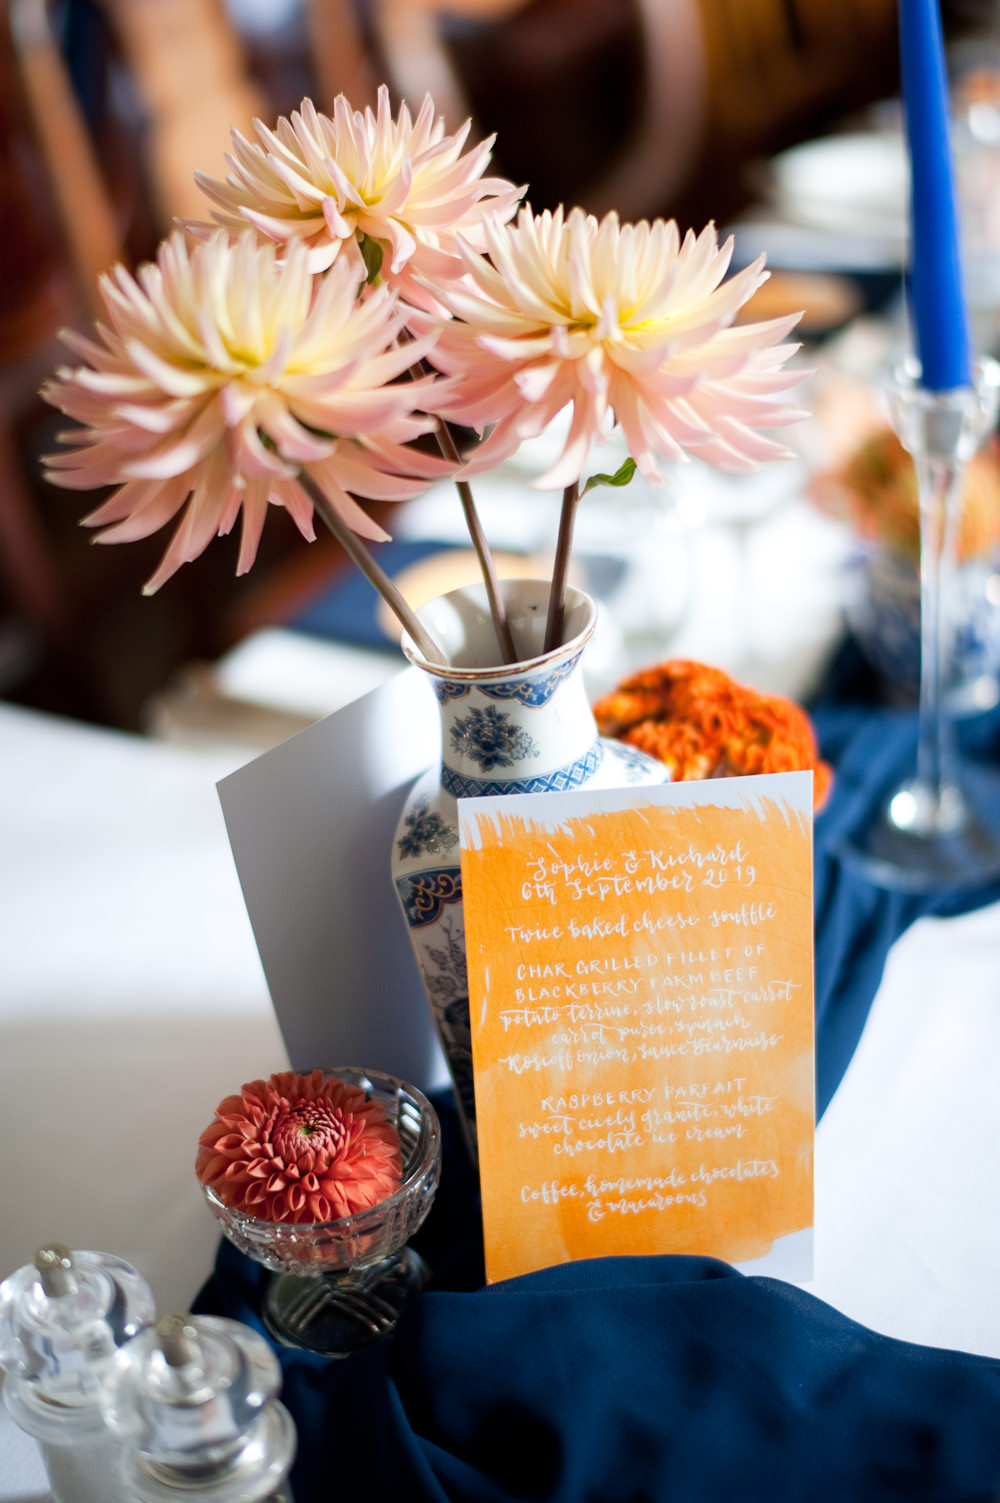 Coral Orange Dahlias Centrepiece Flowers Table Candles Blue Cloth Table Name Floral Wedding Rachael Connerton Photography